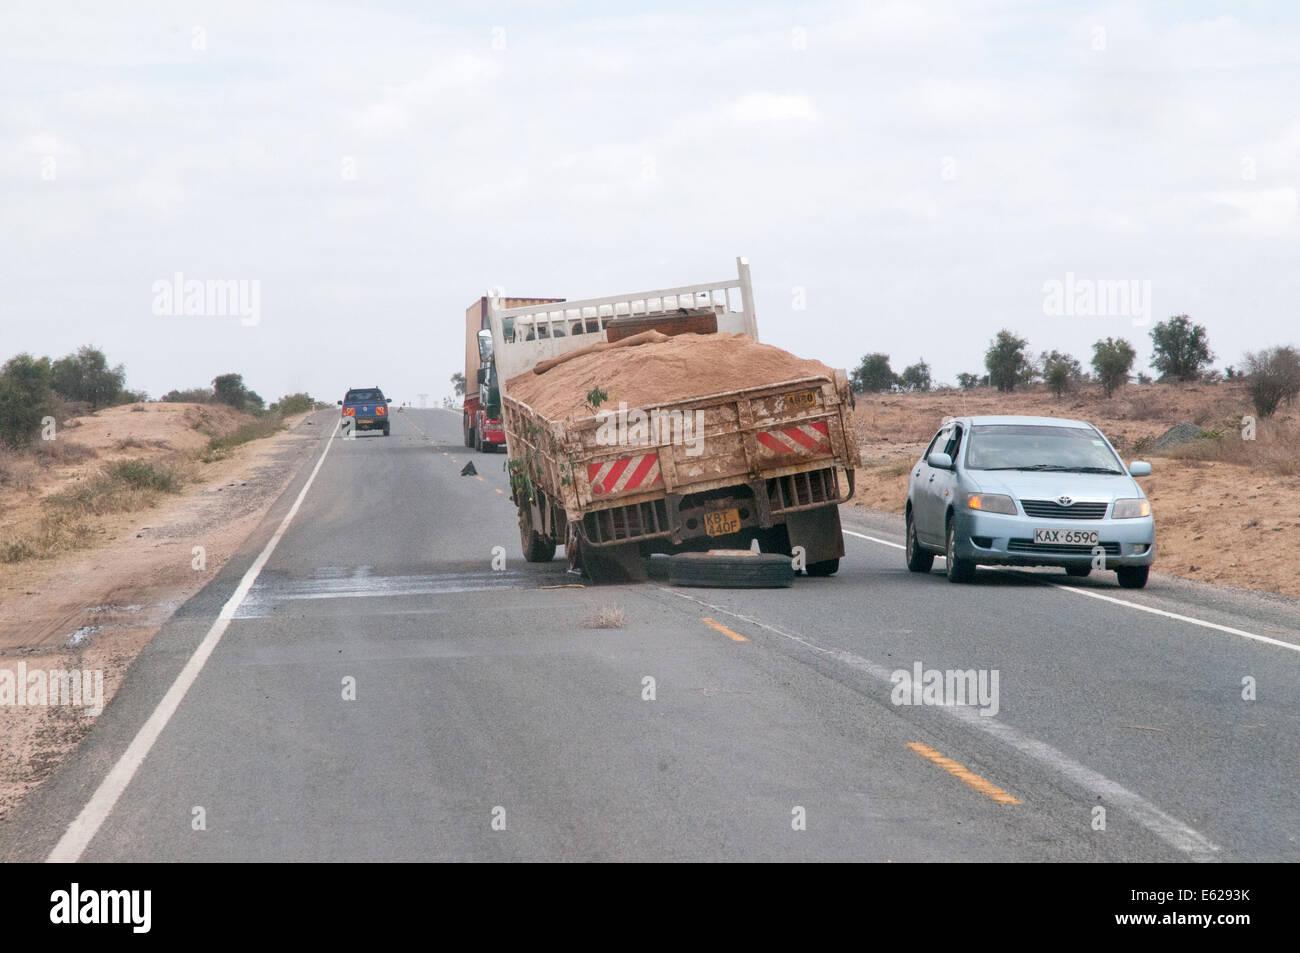 Traffic passing broken down truck lorry with broken rear spring on Namanga Nairobi Road Kenya East Africa - Stock Image